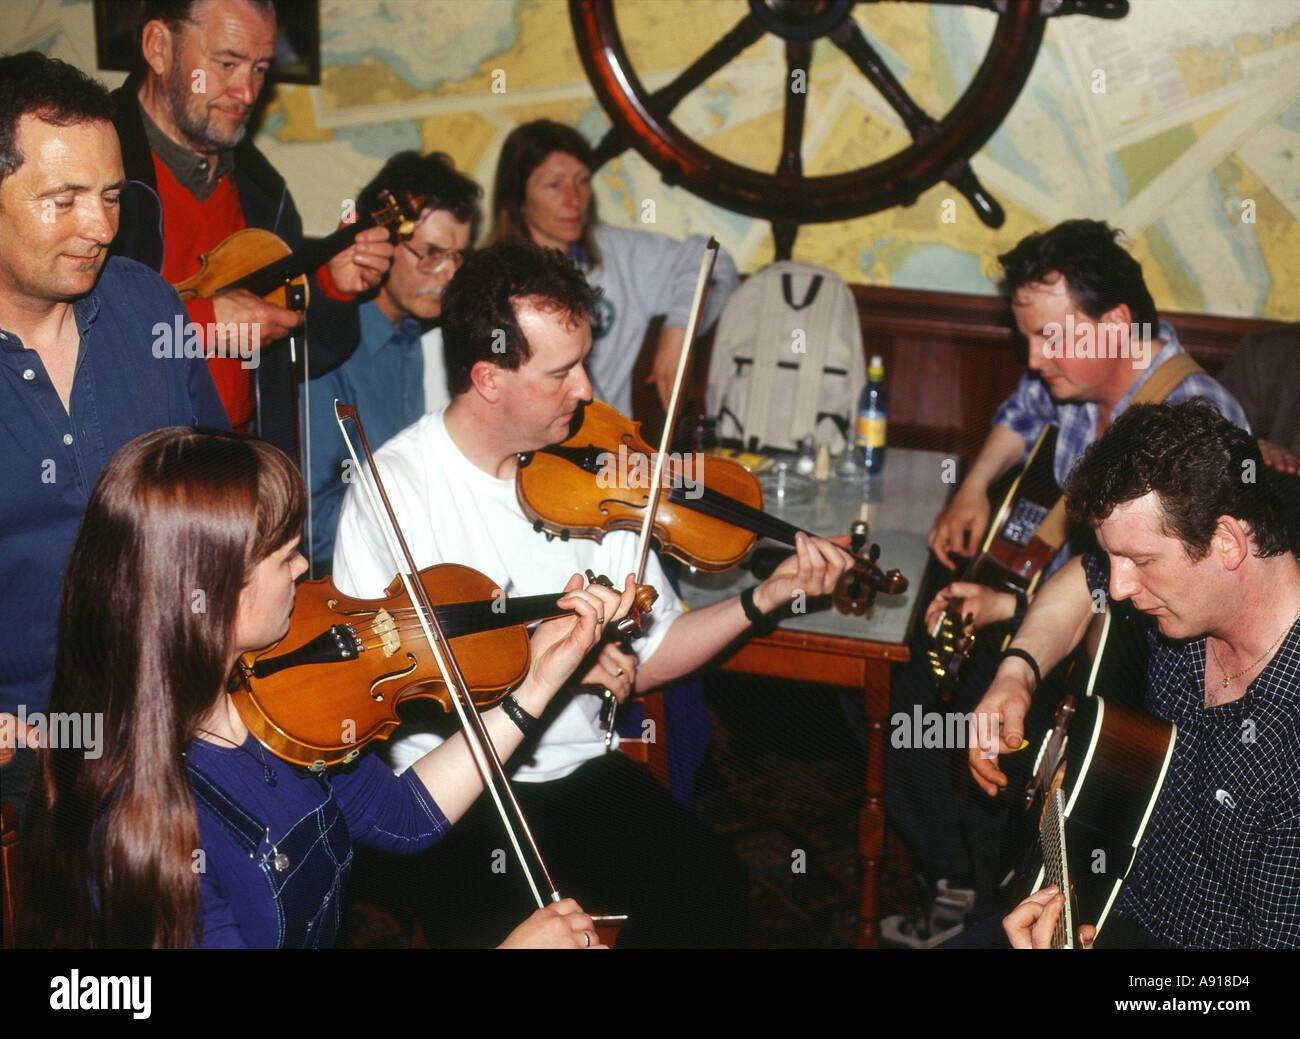 dh Folk Festival STROMNESS ORKNEY Folk group guitars and violins in Ferry Inn public house scotland pub music Stock Photo